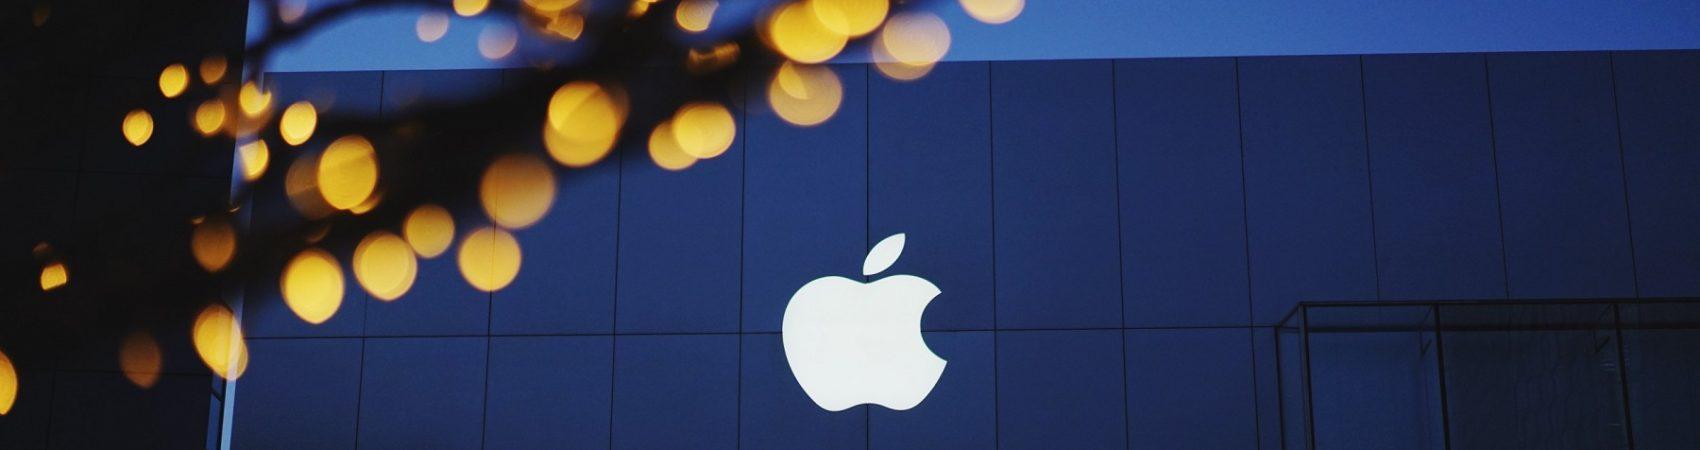 Apple (AAPL) Analysis